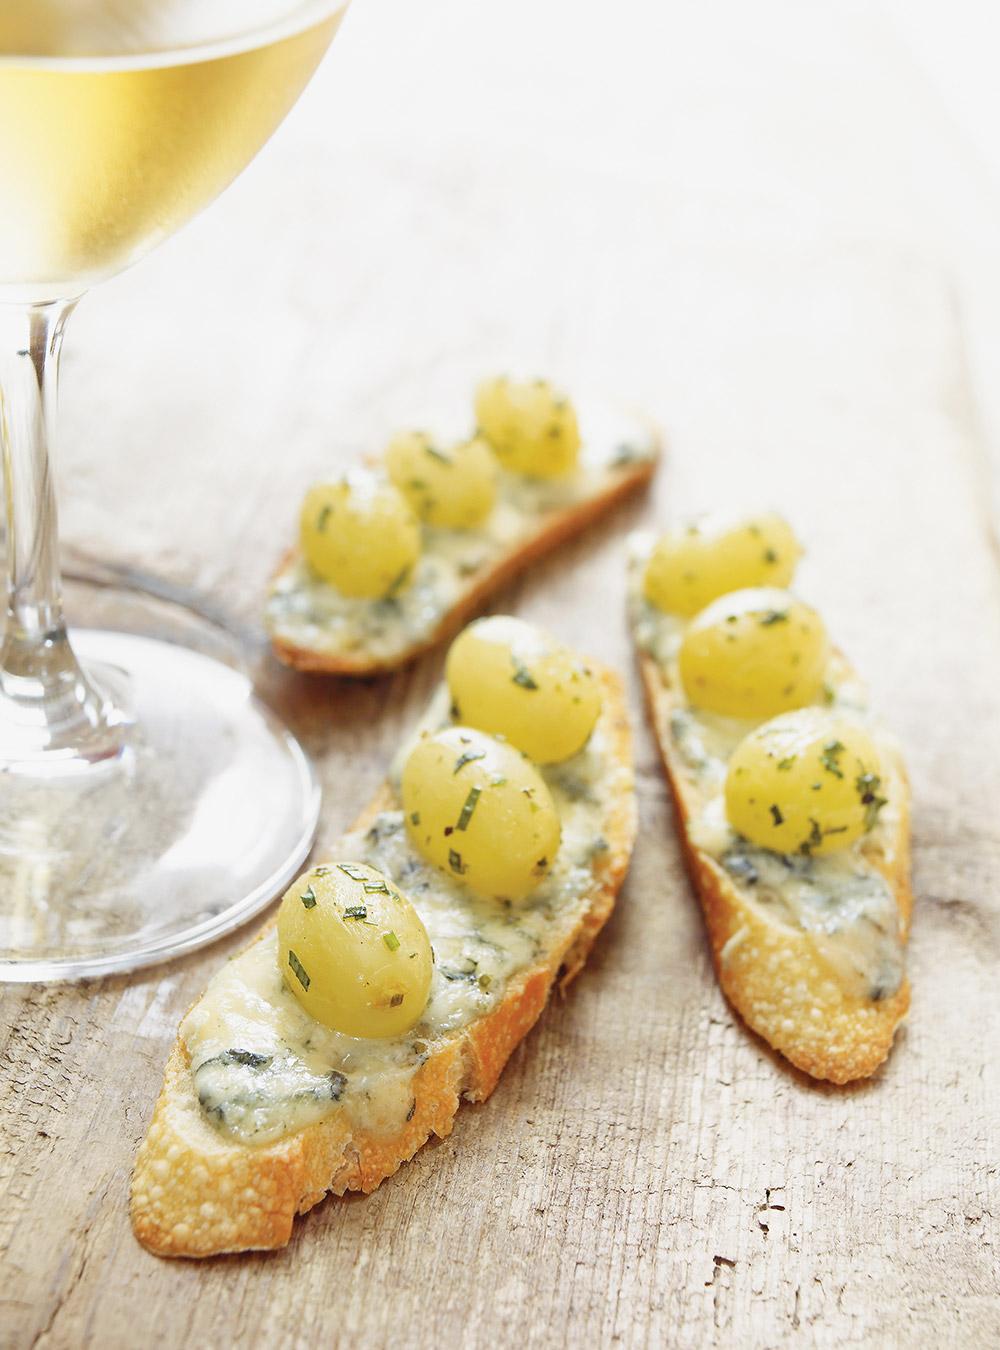 Croûtons de roquefort et raisins verts confits | ricardo